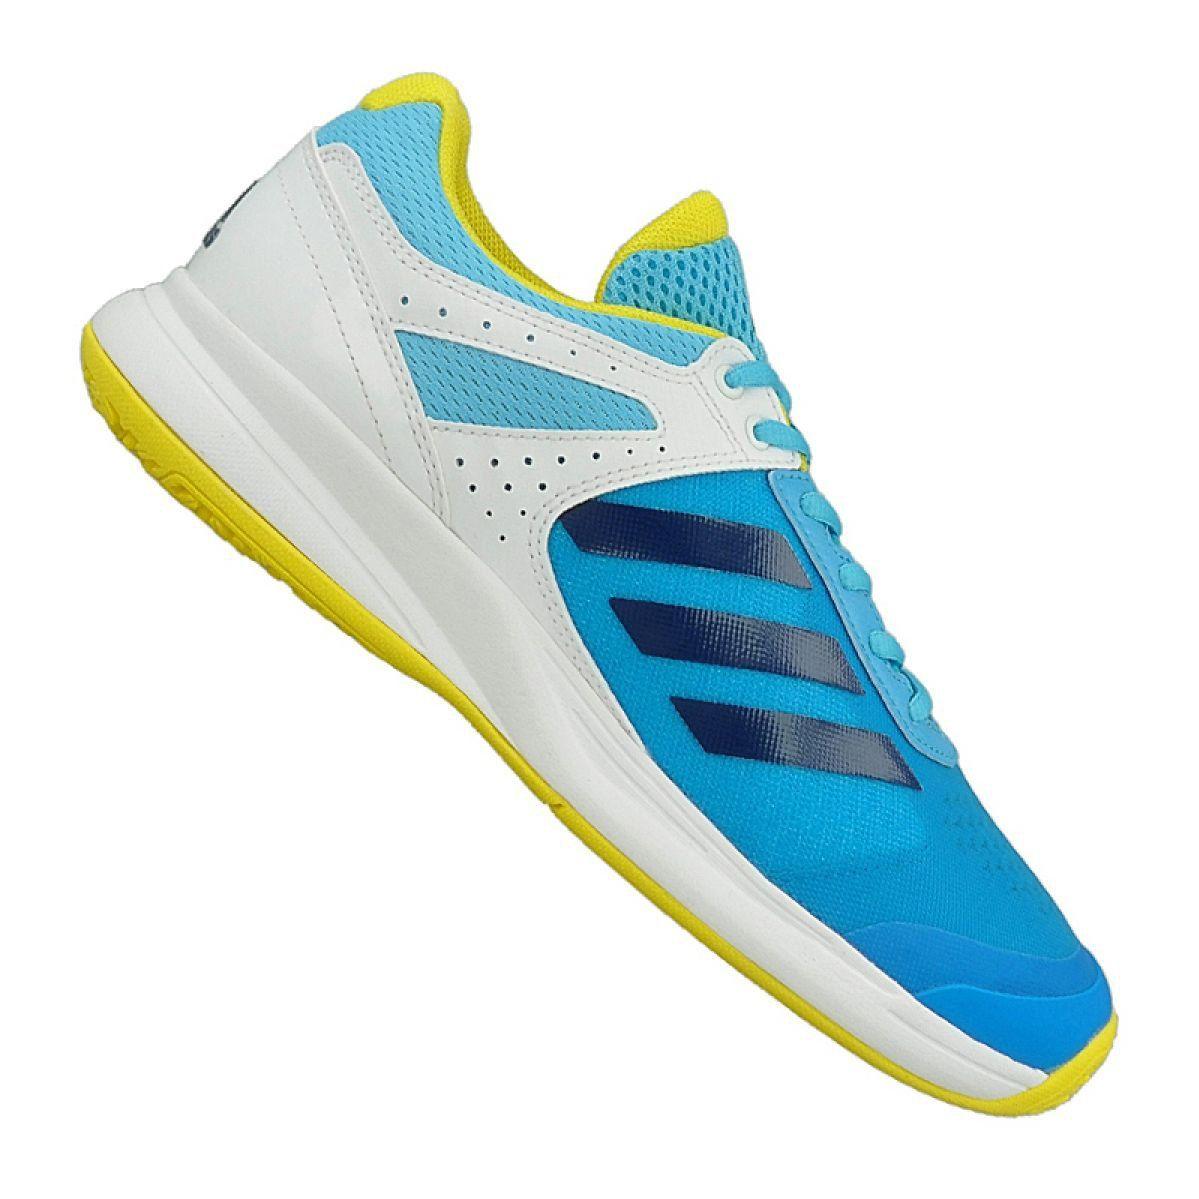 Buty Do Tenisa Adidas Adizero Court Oc M Bb3413 Niebieskie Adidas Blue Shoes Tennis Shoes